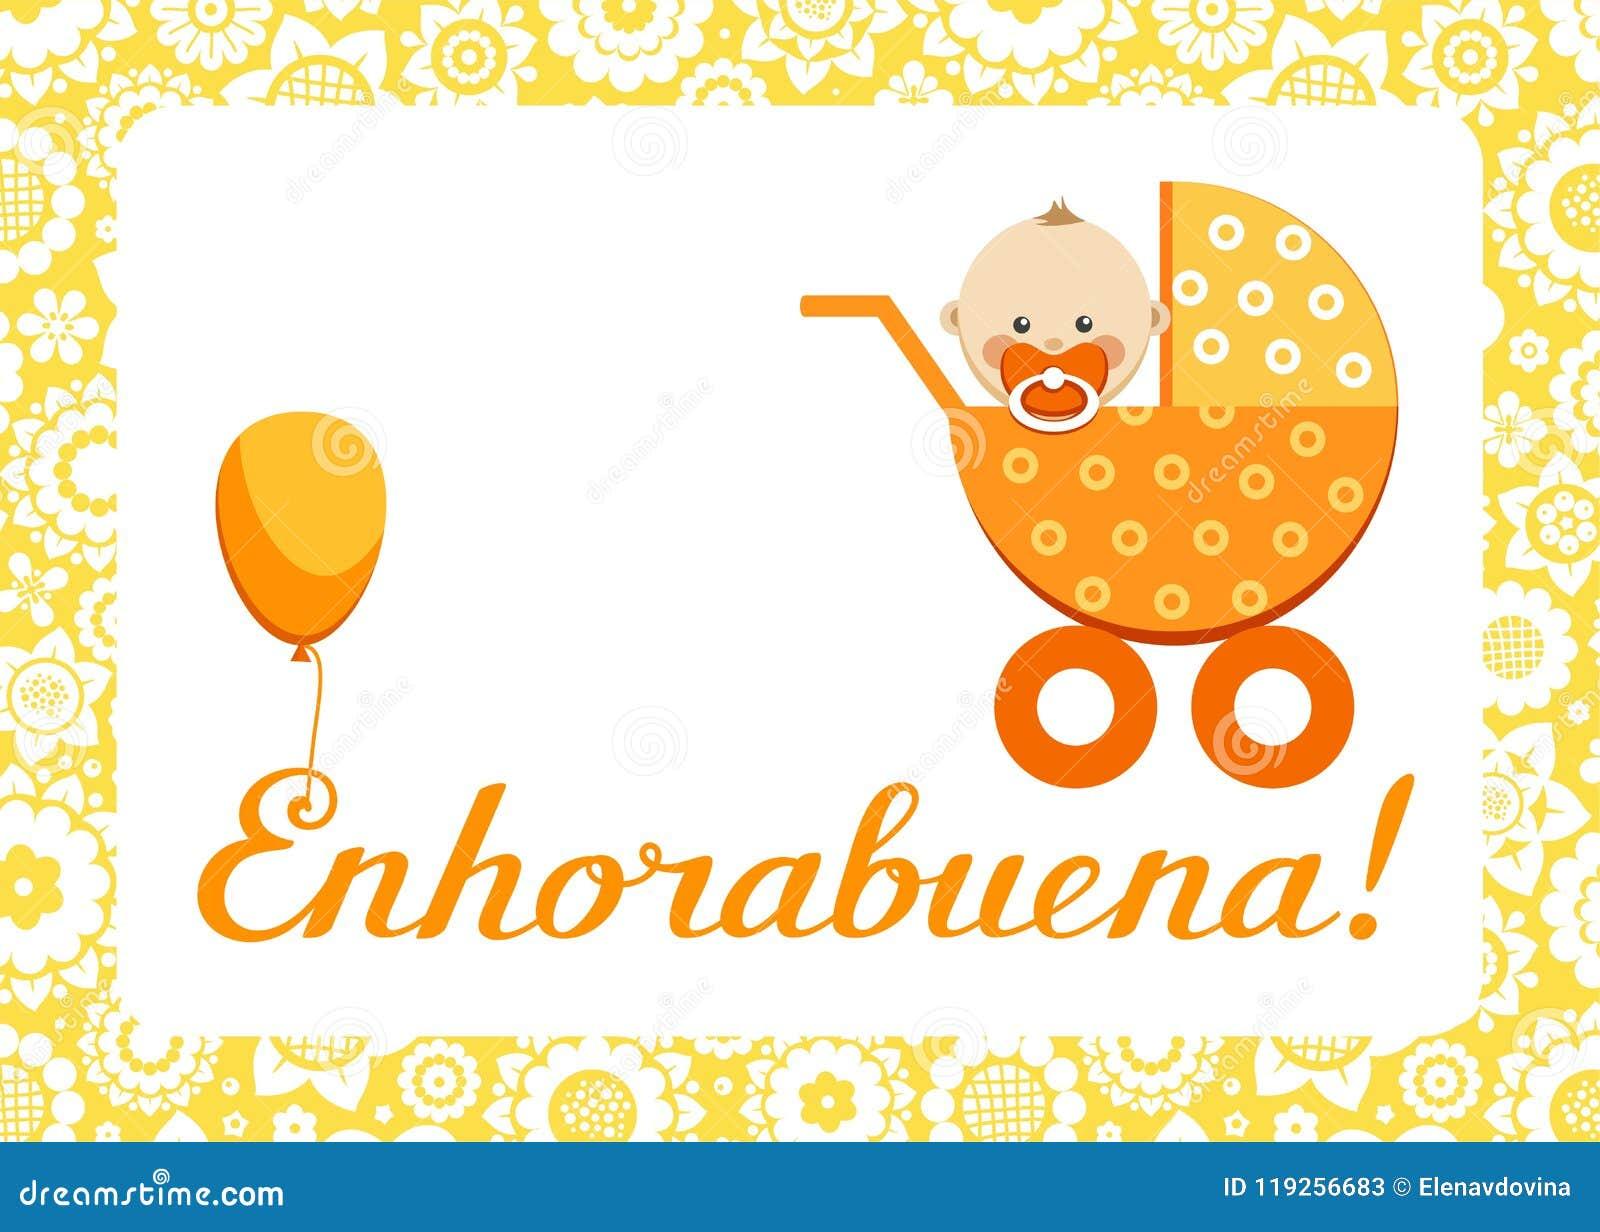 Congratulations new baby greeting card spanish vector stock congratulations new baby greeting card spanish vector m4hsunfo